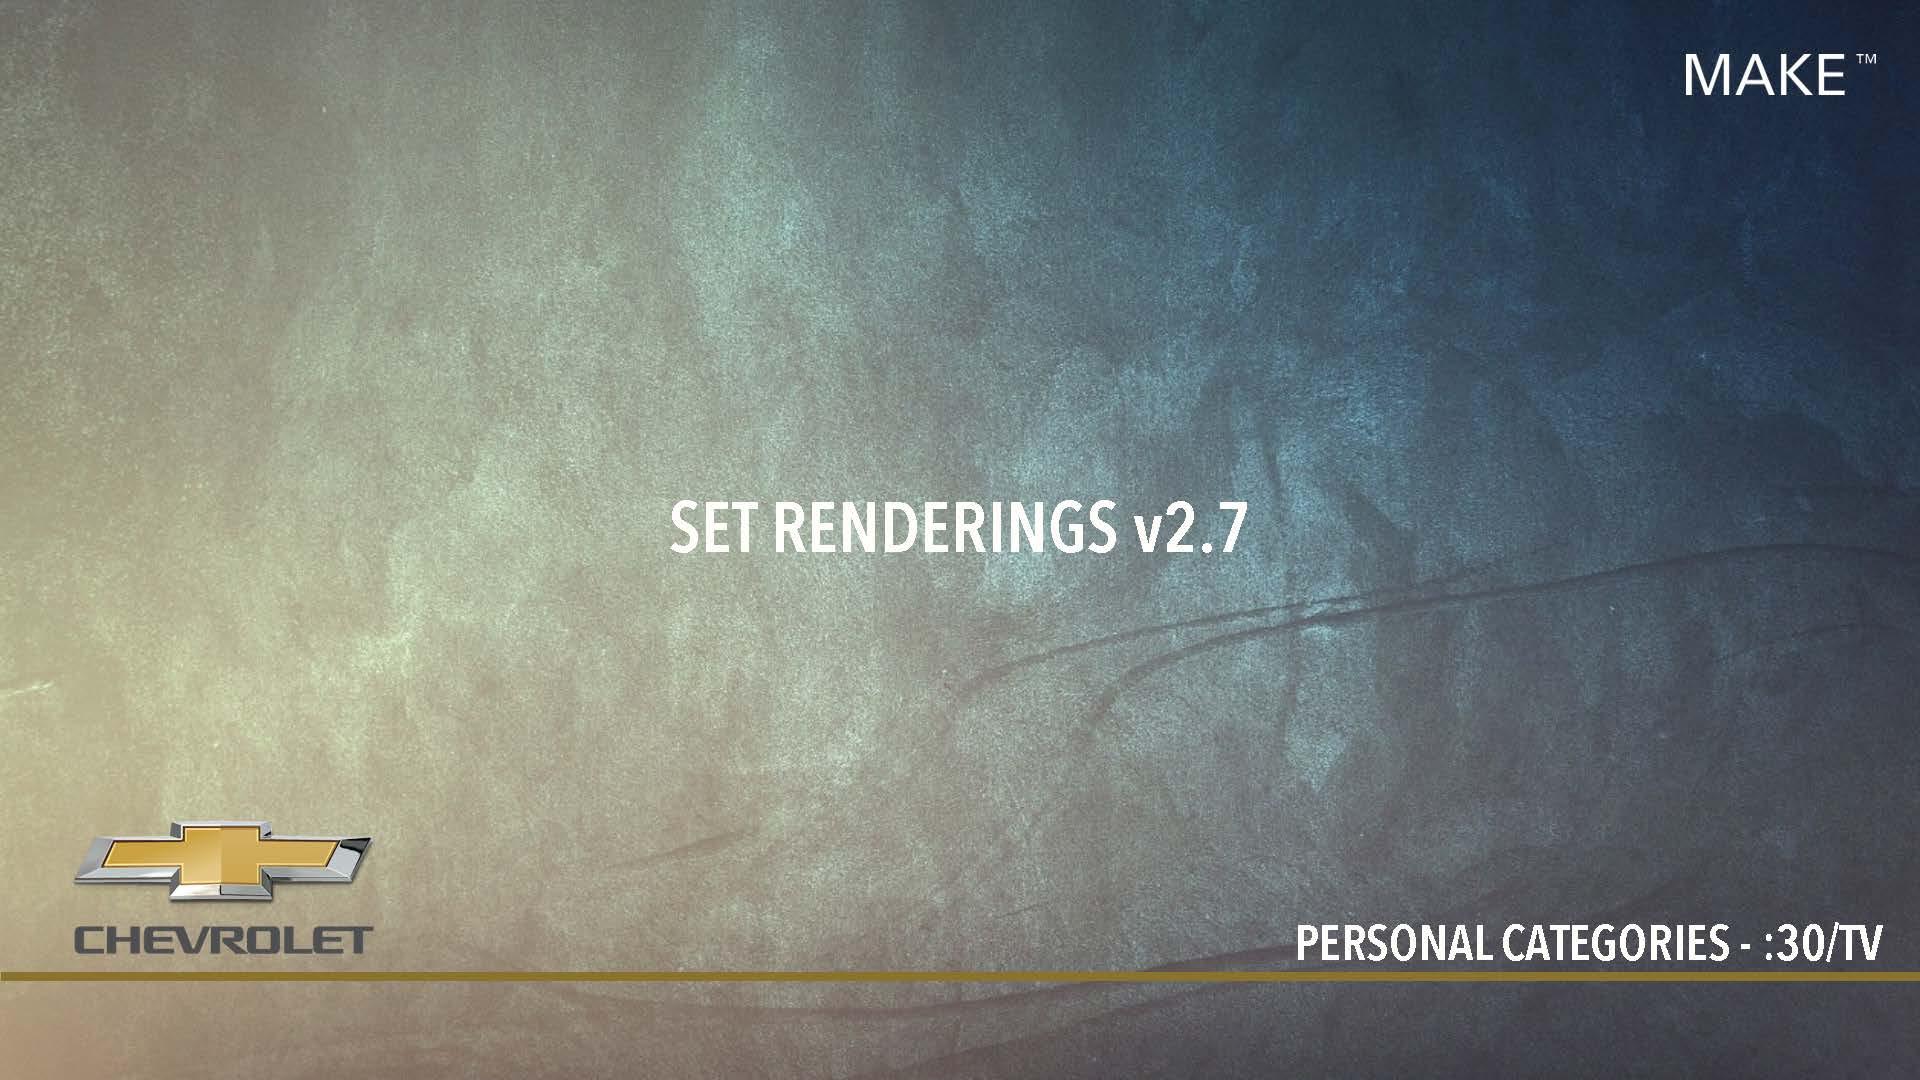 Chevy RETAIL- Set Renderings v2.7 copy_Page_1.jpg